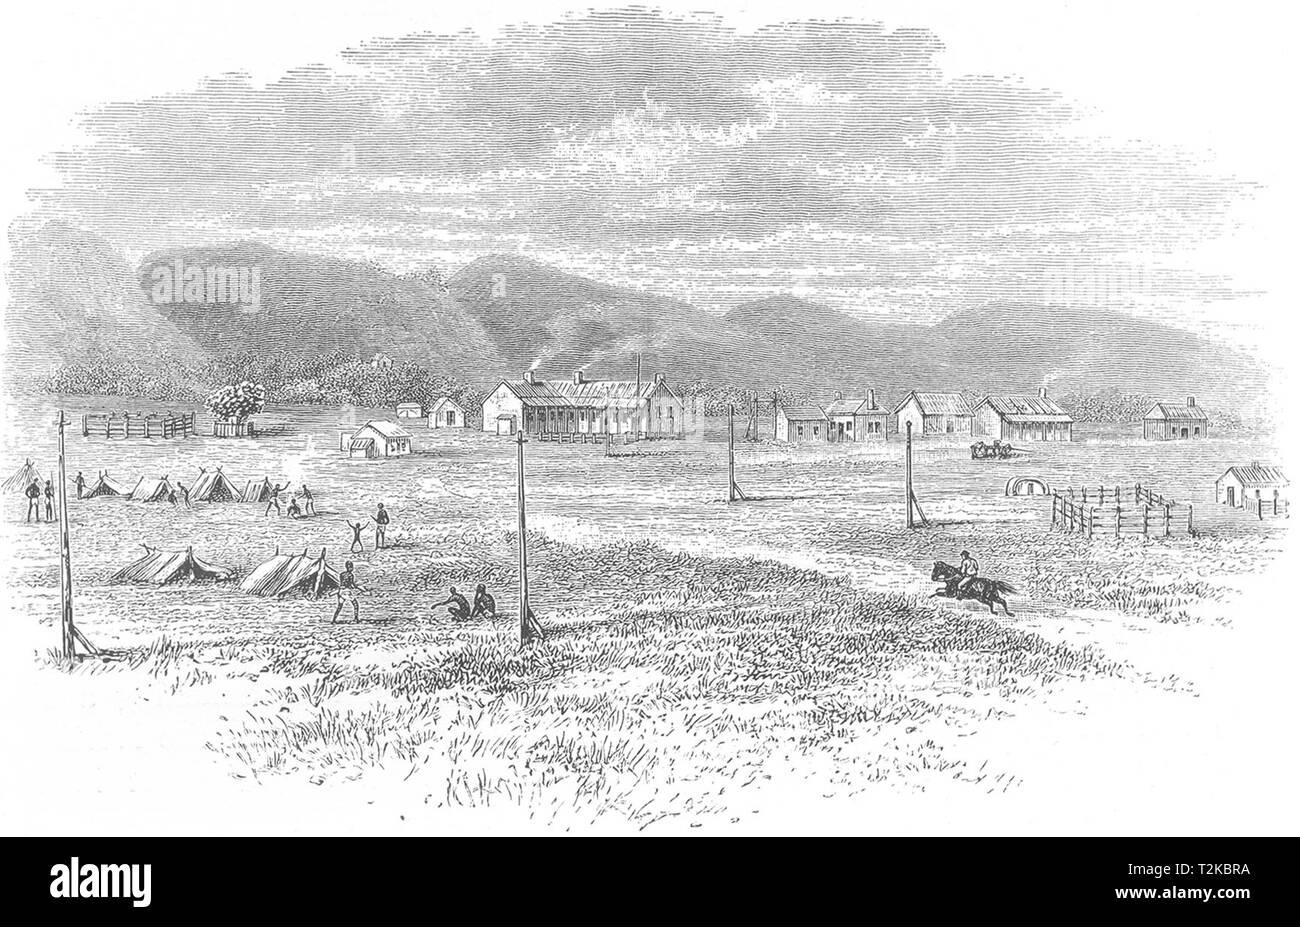 AUSTRALIA. South Australia. Peake overland telegraph station 1886 old print - Stock Image